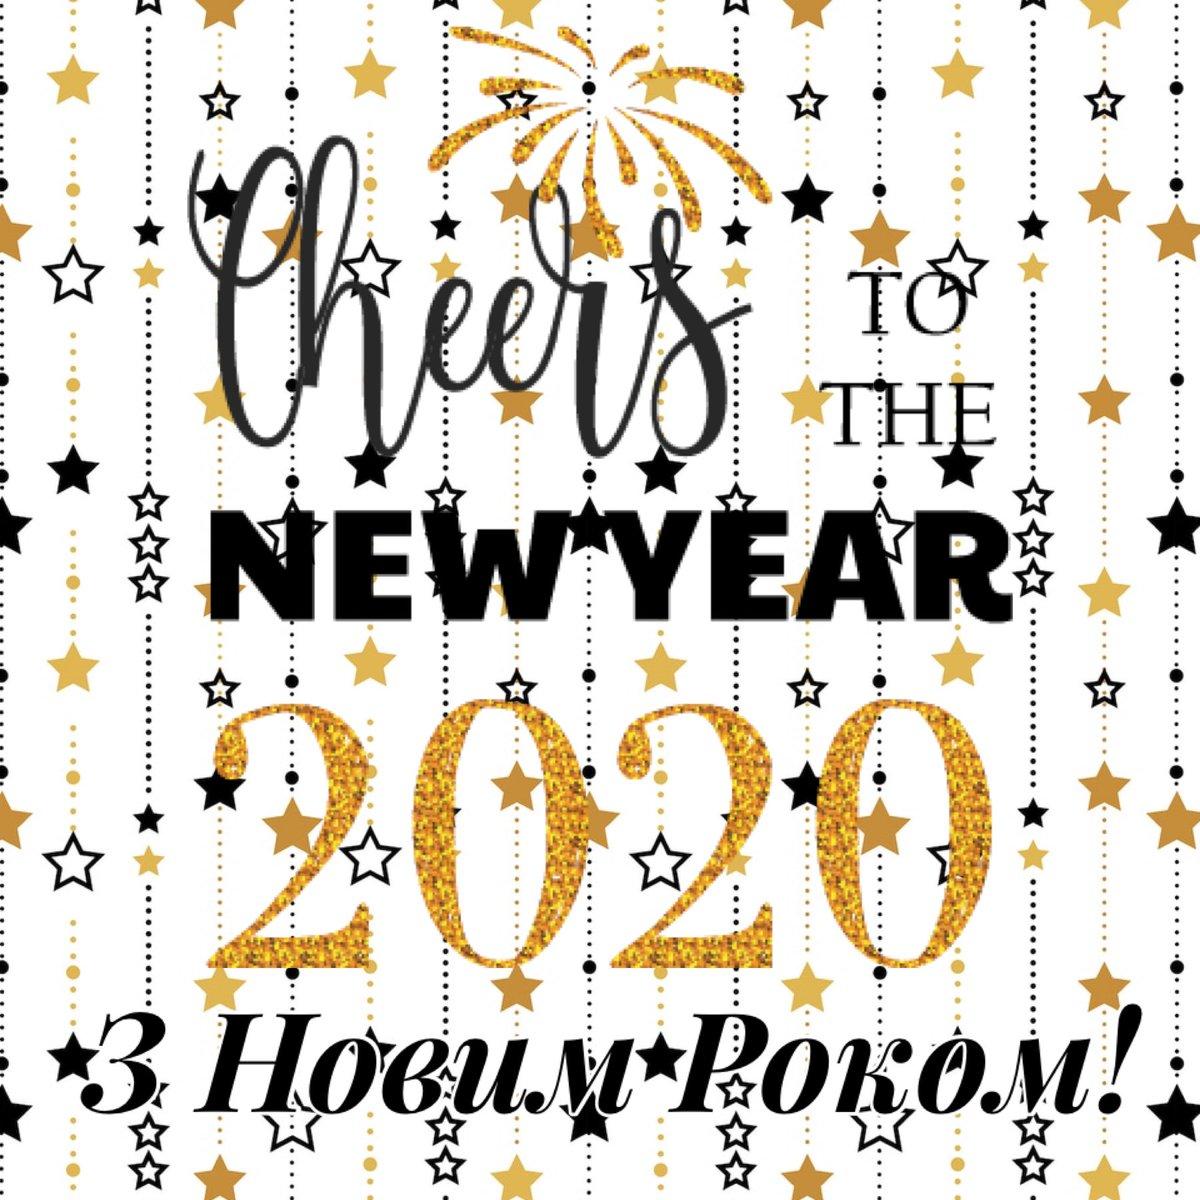 test Twitter Media - RT @KyivPavilion: Happy New Year!  З Новим Роком! 🥂🎉 https://t.co/Piggp5HTPb